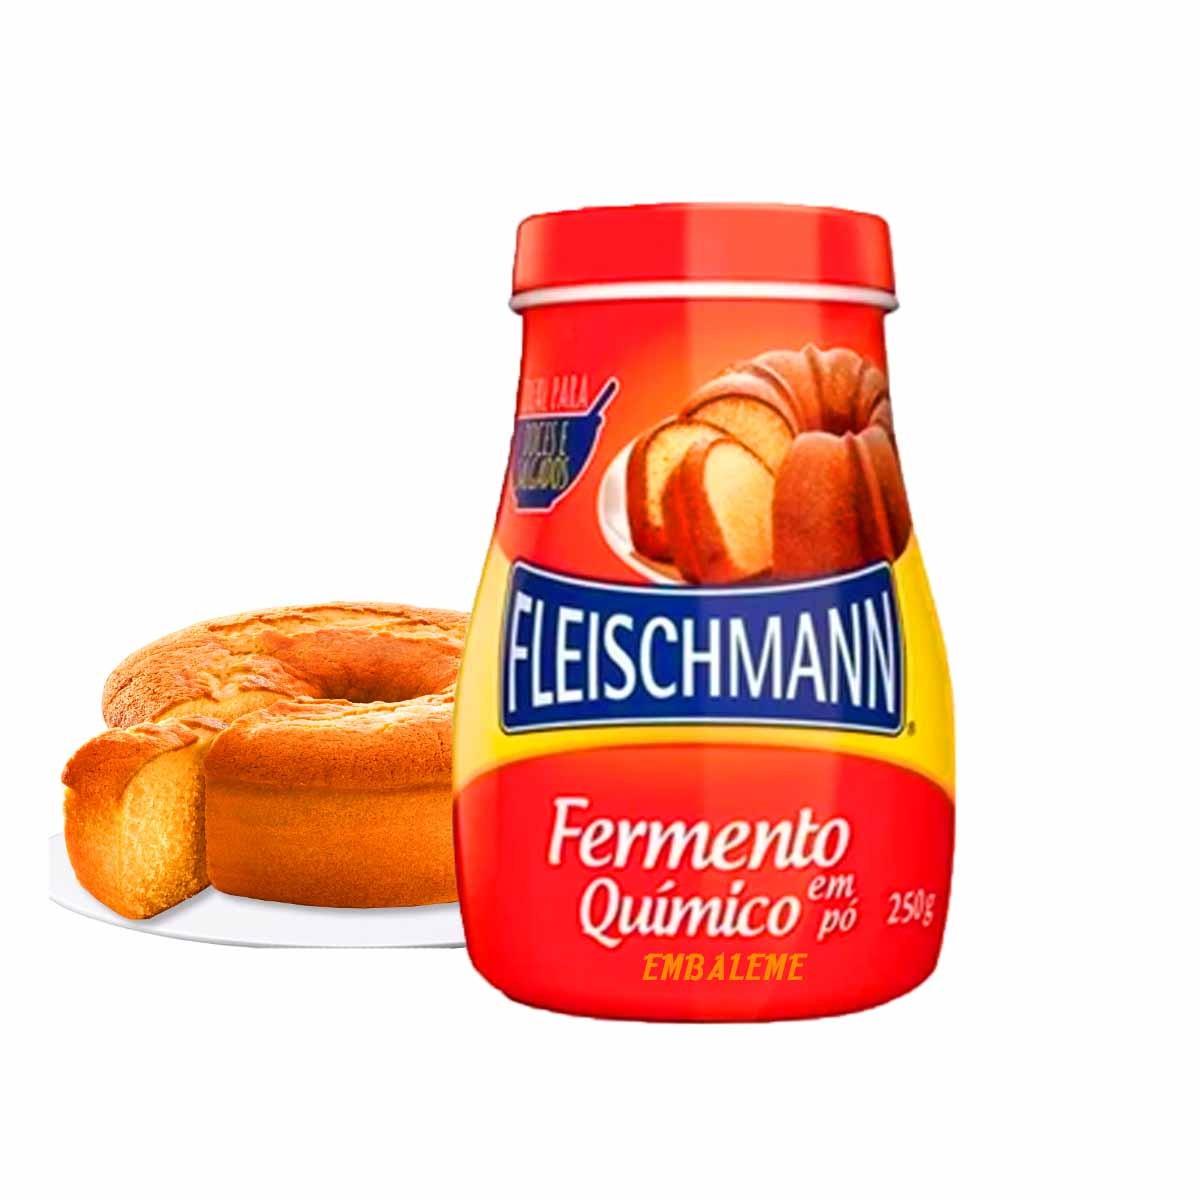 Fermento em Pó Químico Fleischmann 250g